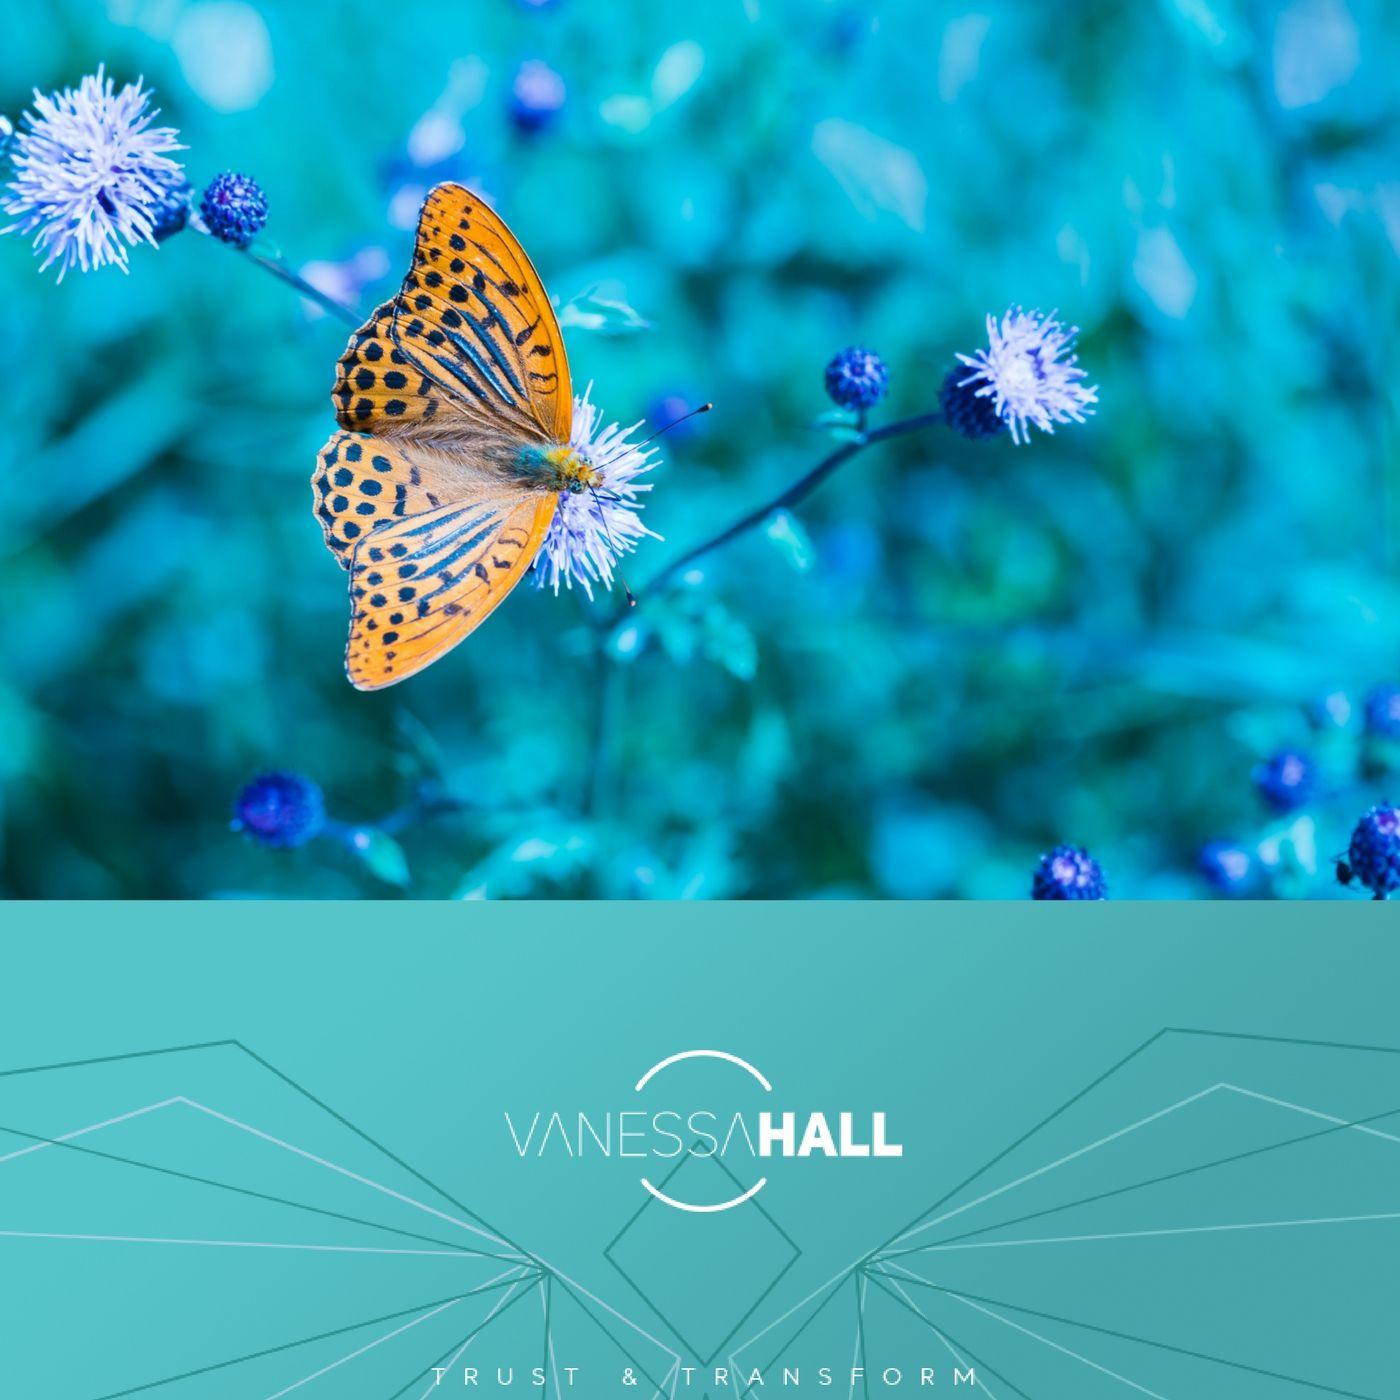 Vanessa Hall on Trust and Transformation